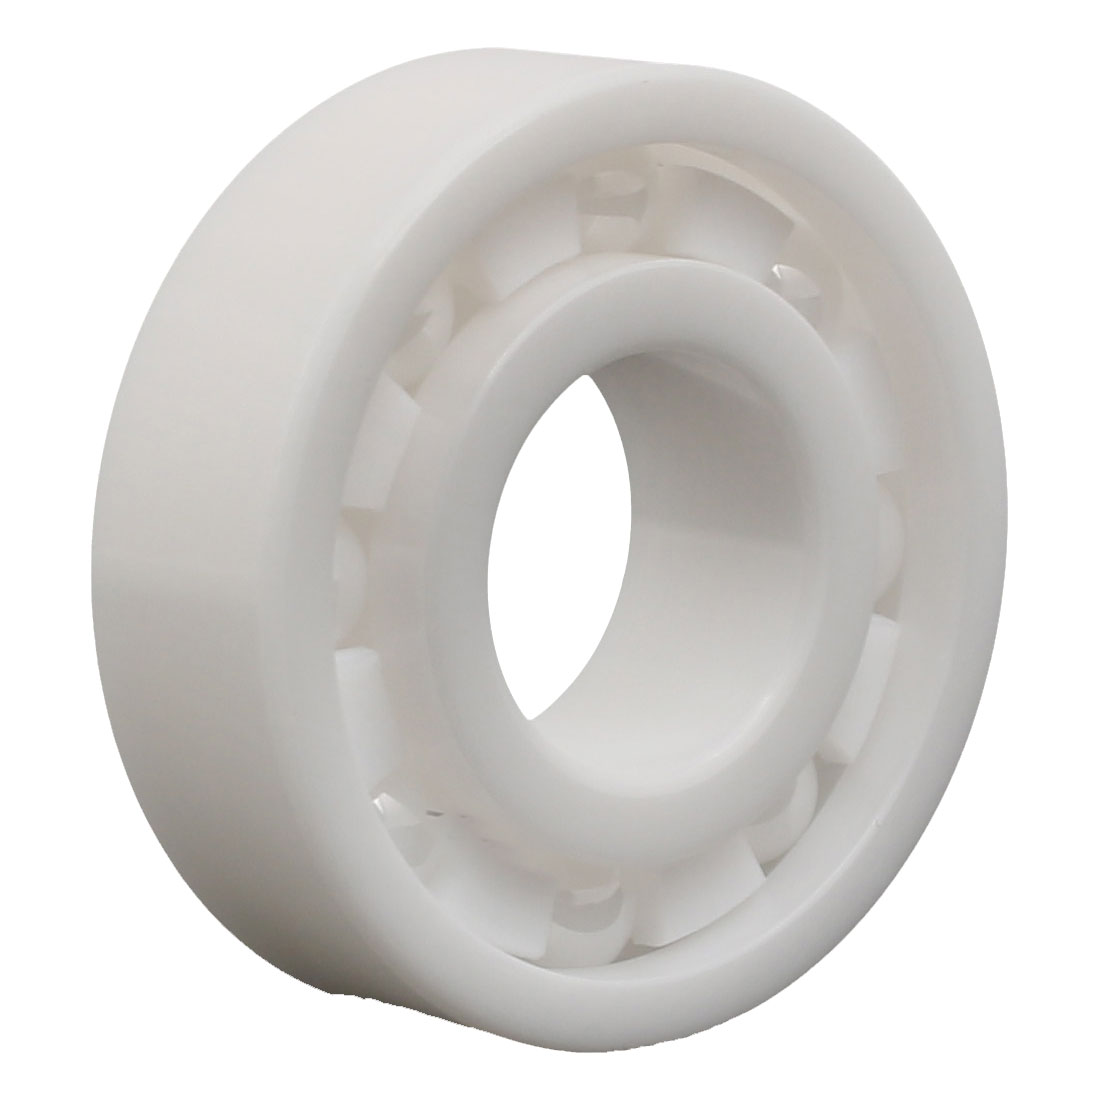 17mmx40mmx12mm Full Ceramic Zirconia Oxide Ball Bearing 6203